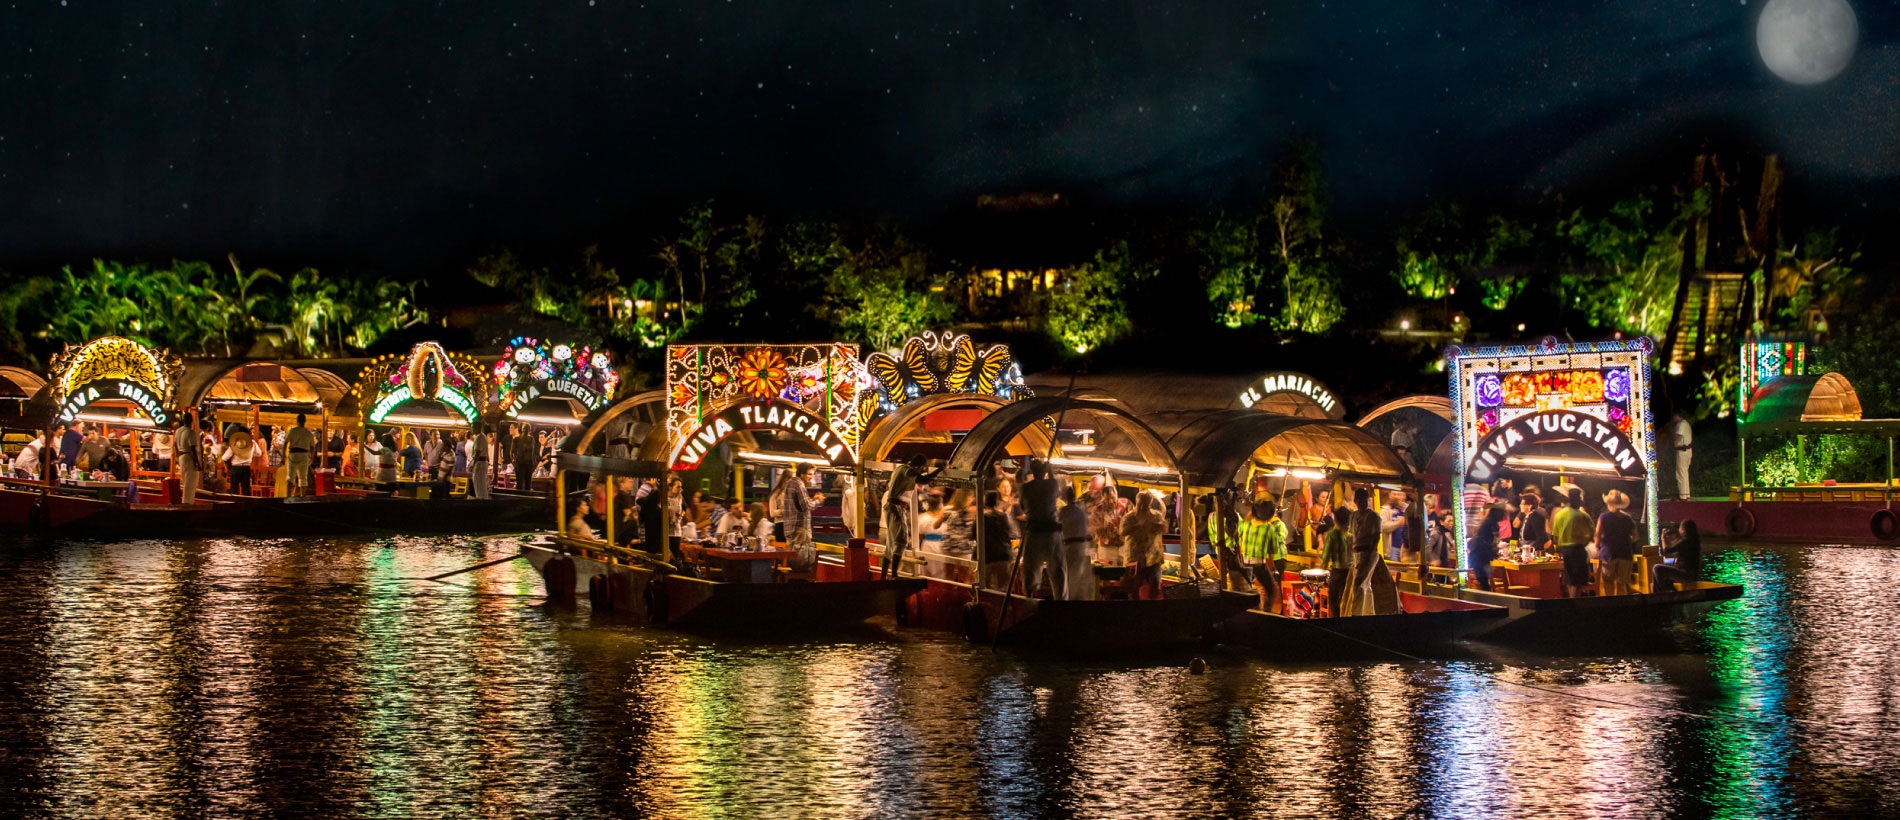 Festival ¡Viva México en Xochimilco!